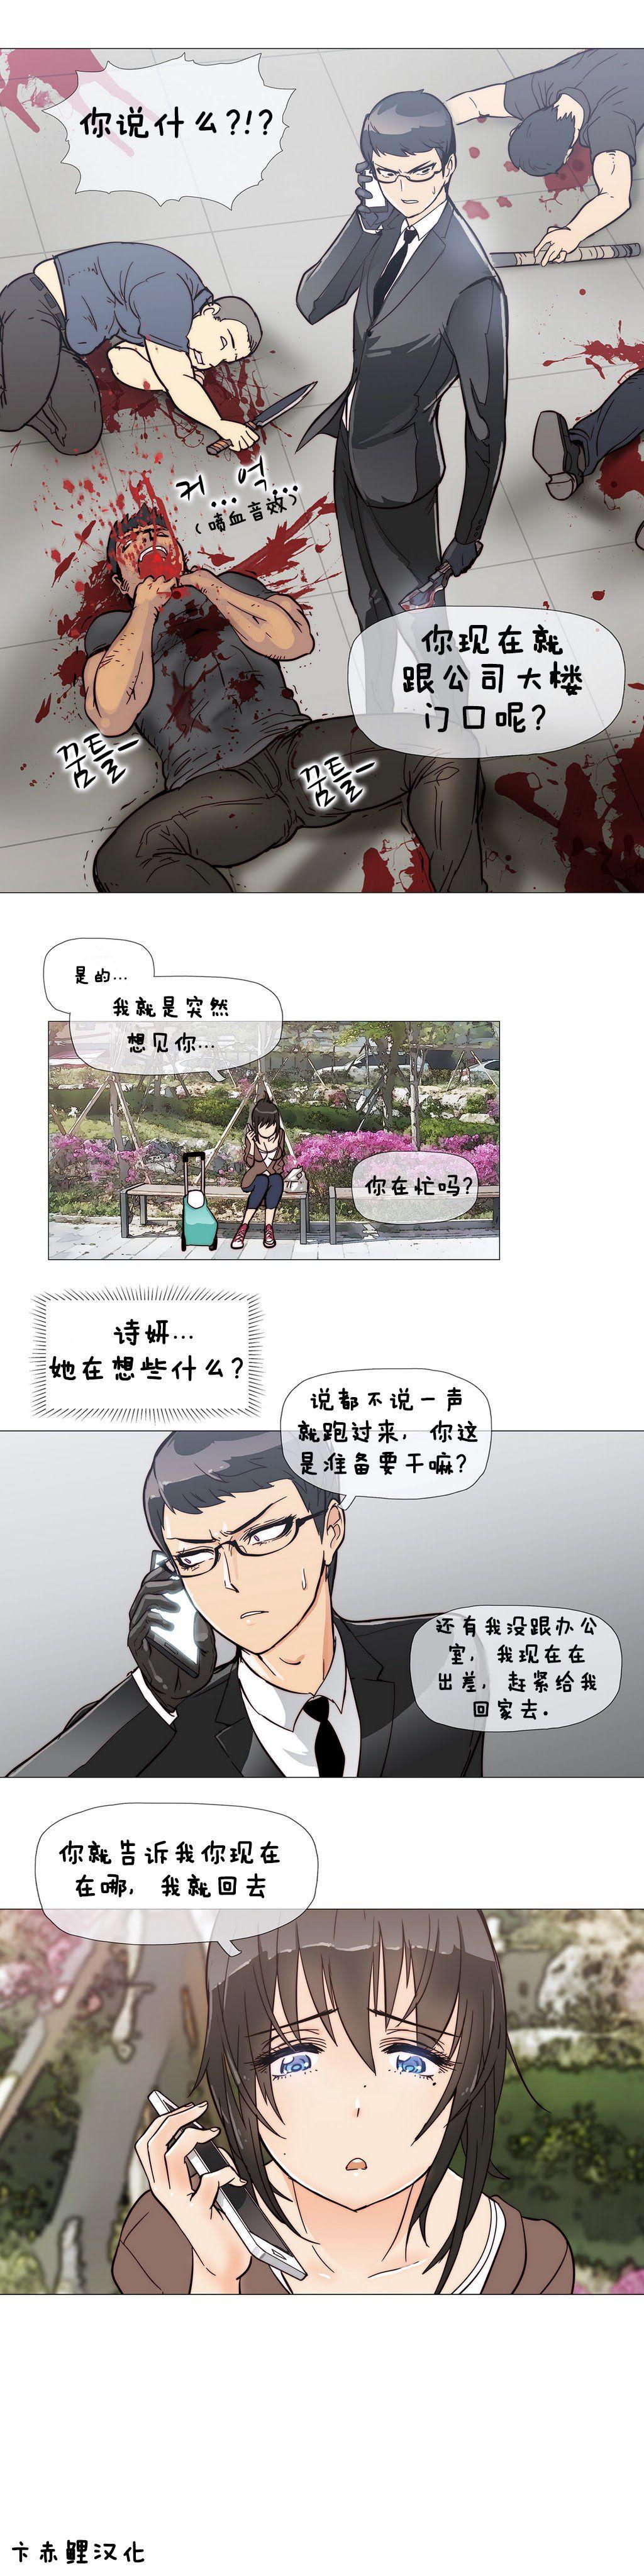 HouseHold Affairs 【卞赤鲤个人汉化】1~33话(持续更新中) 81